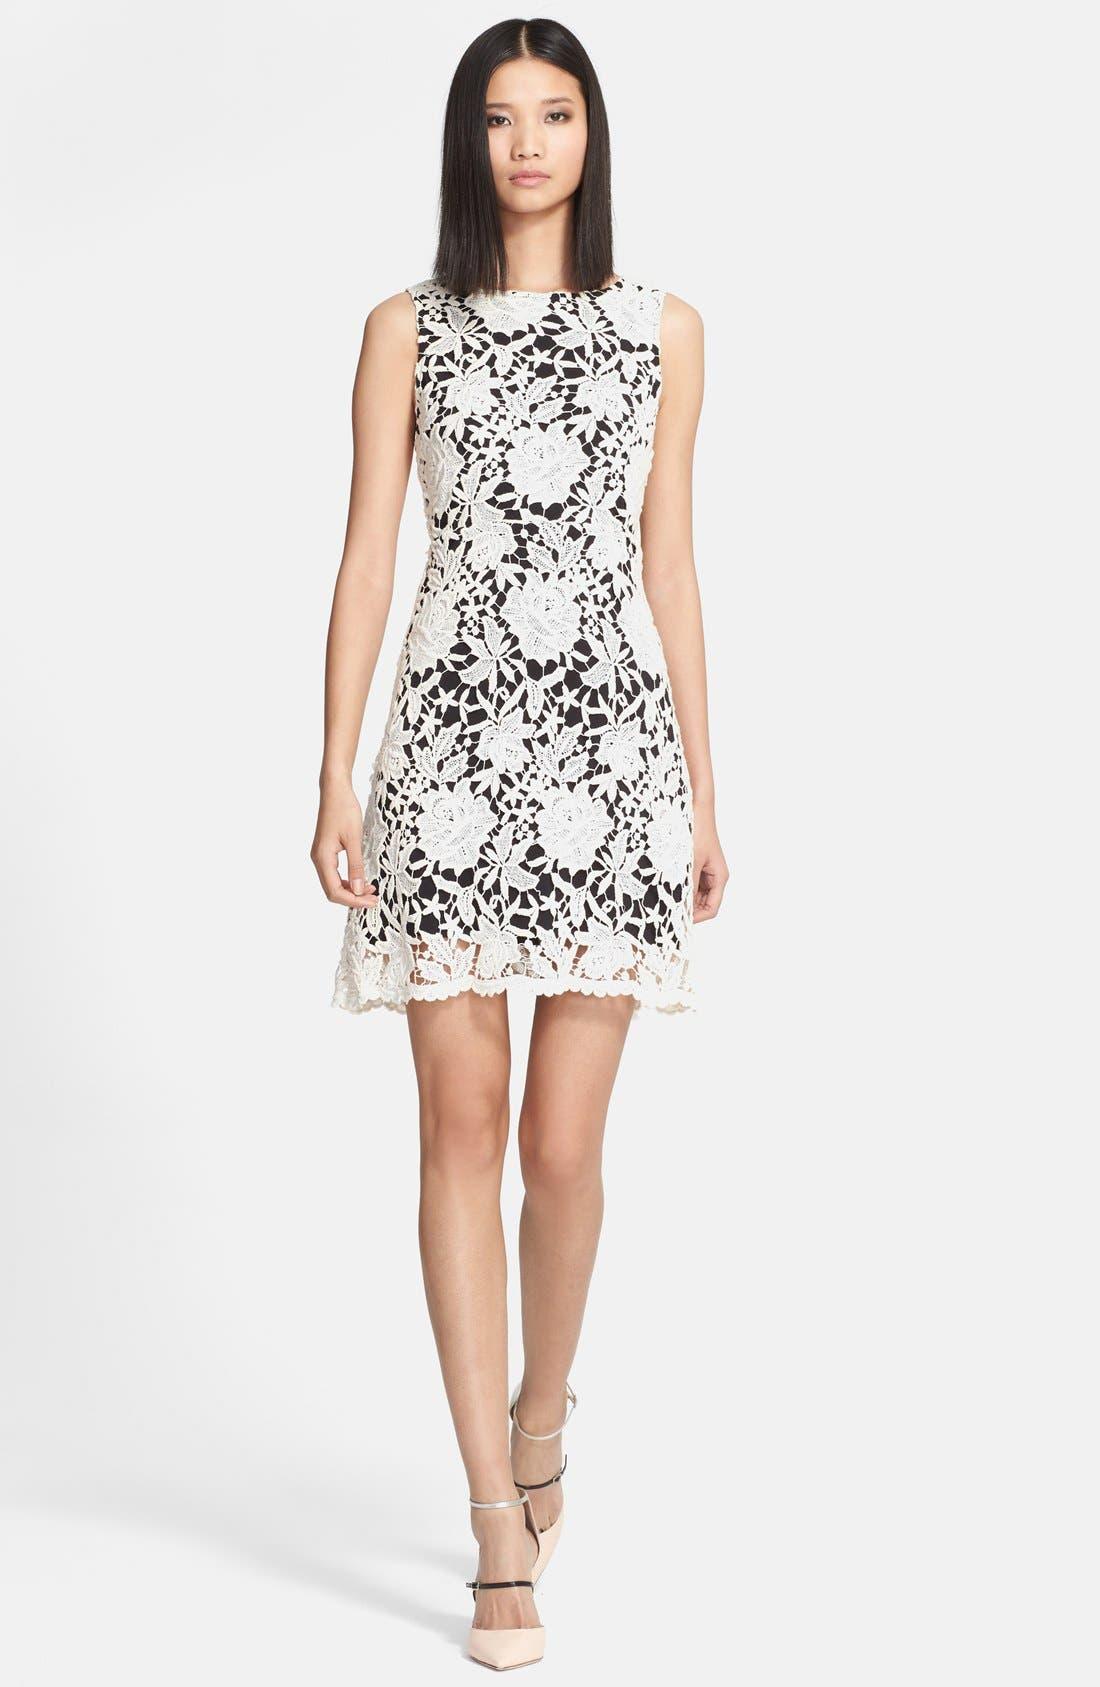 Main Image - Alice + Olivia 'Jolie' Cotton Lace Dress